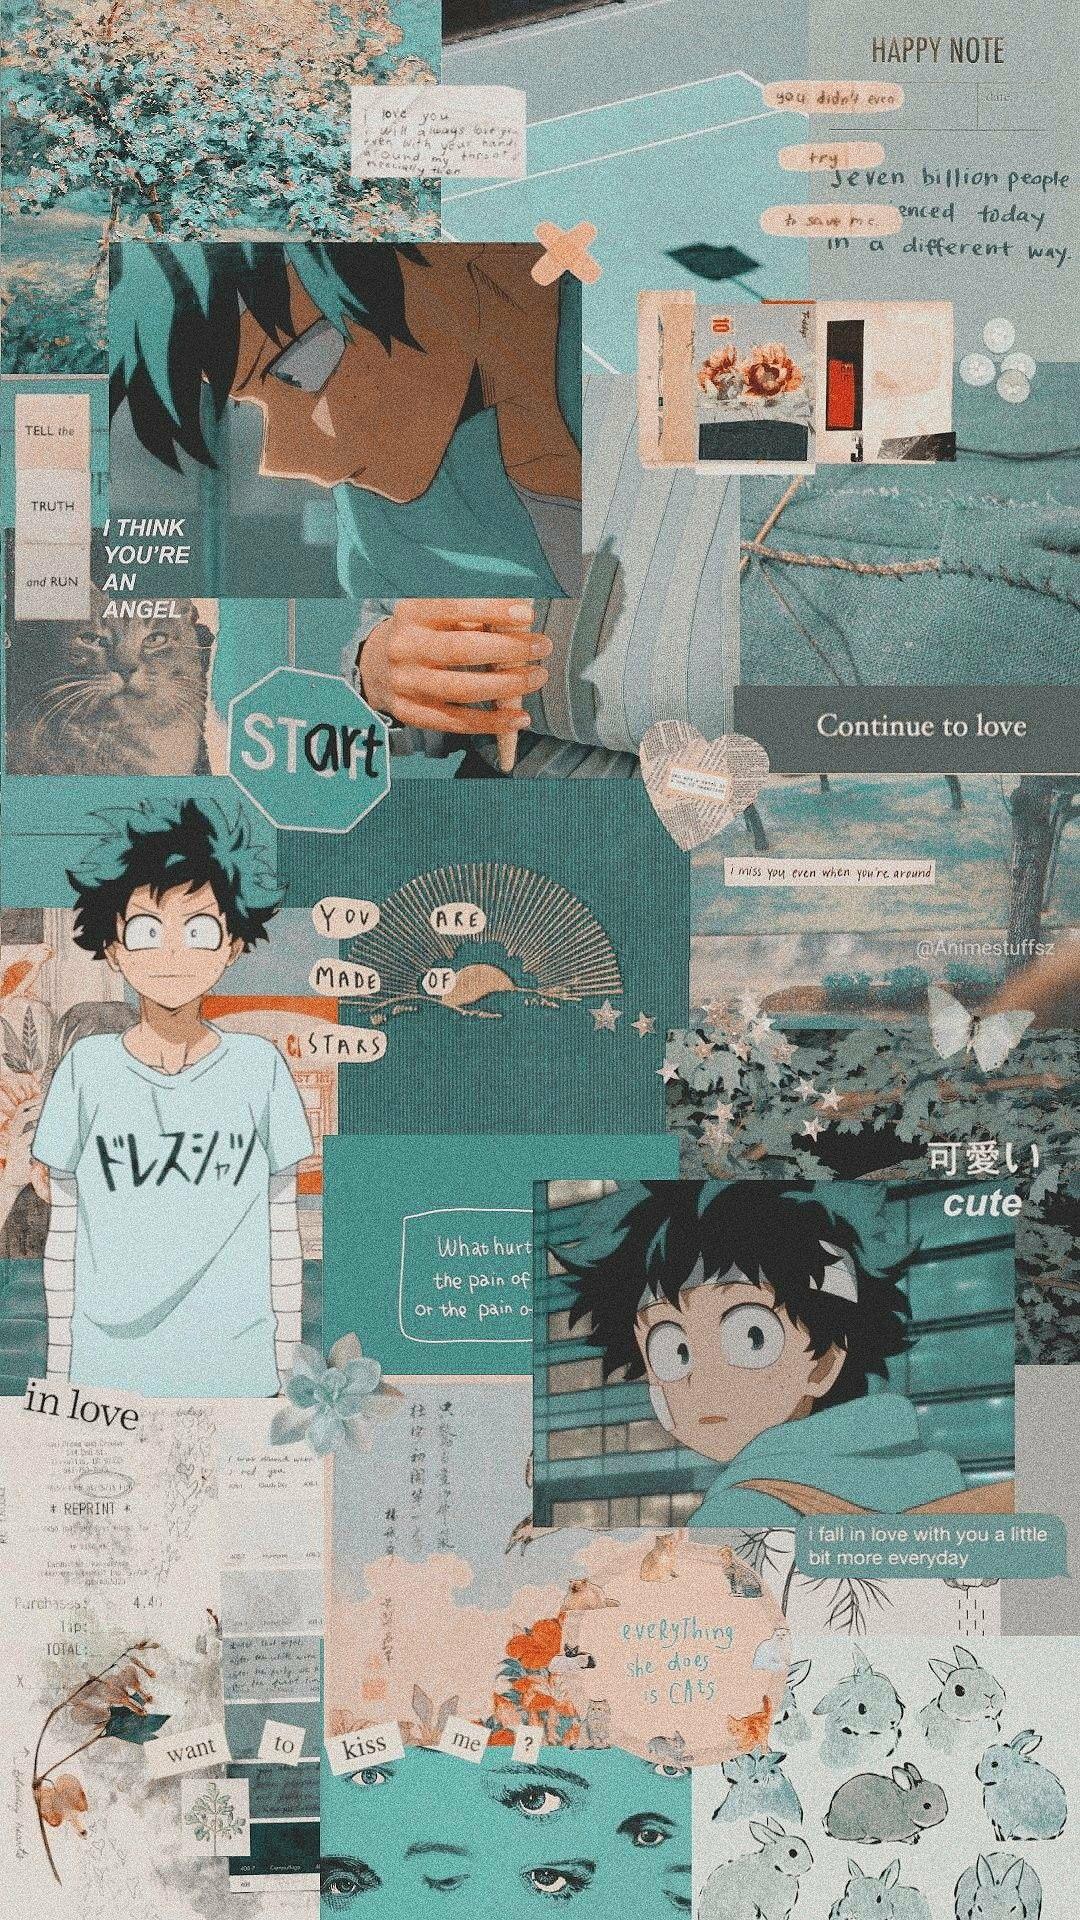 Midoriya Izuku Cute Anime Wallpaper Anime Wallpaper Iphone Hero Wallpaper